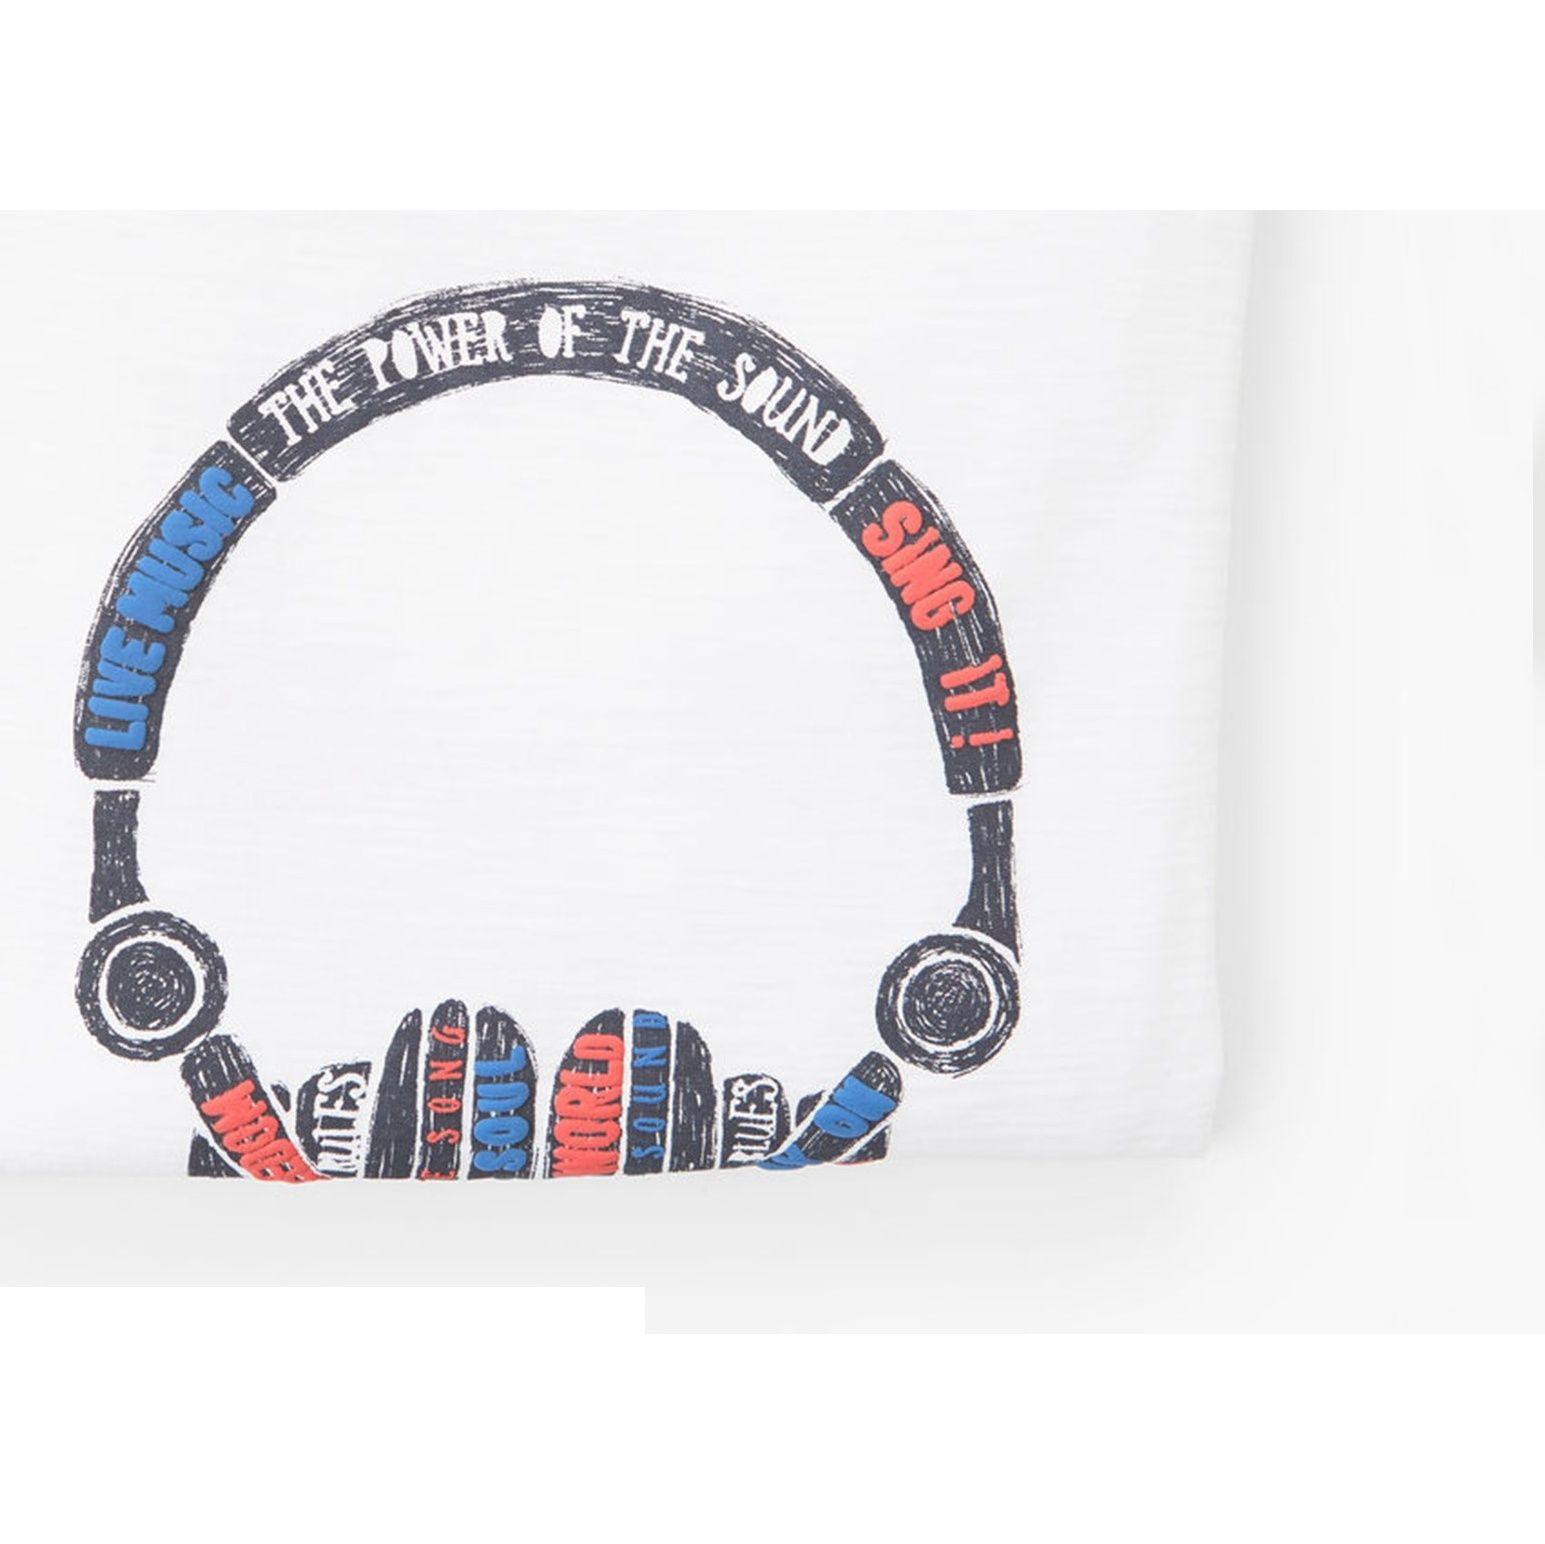 تی شرت نخی پسرانه - مانگو - سفيد - 6